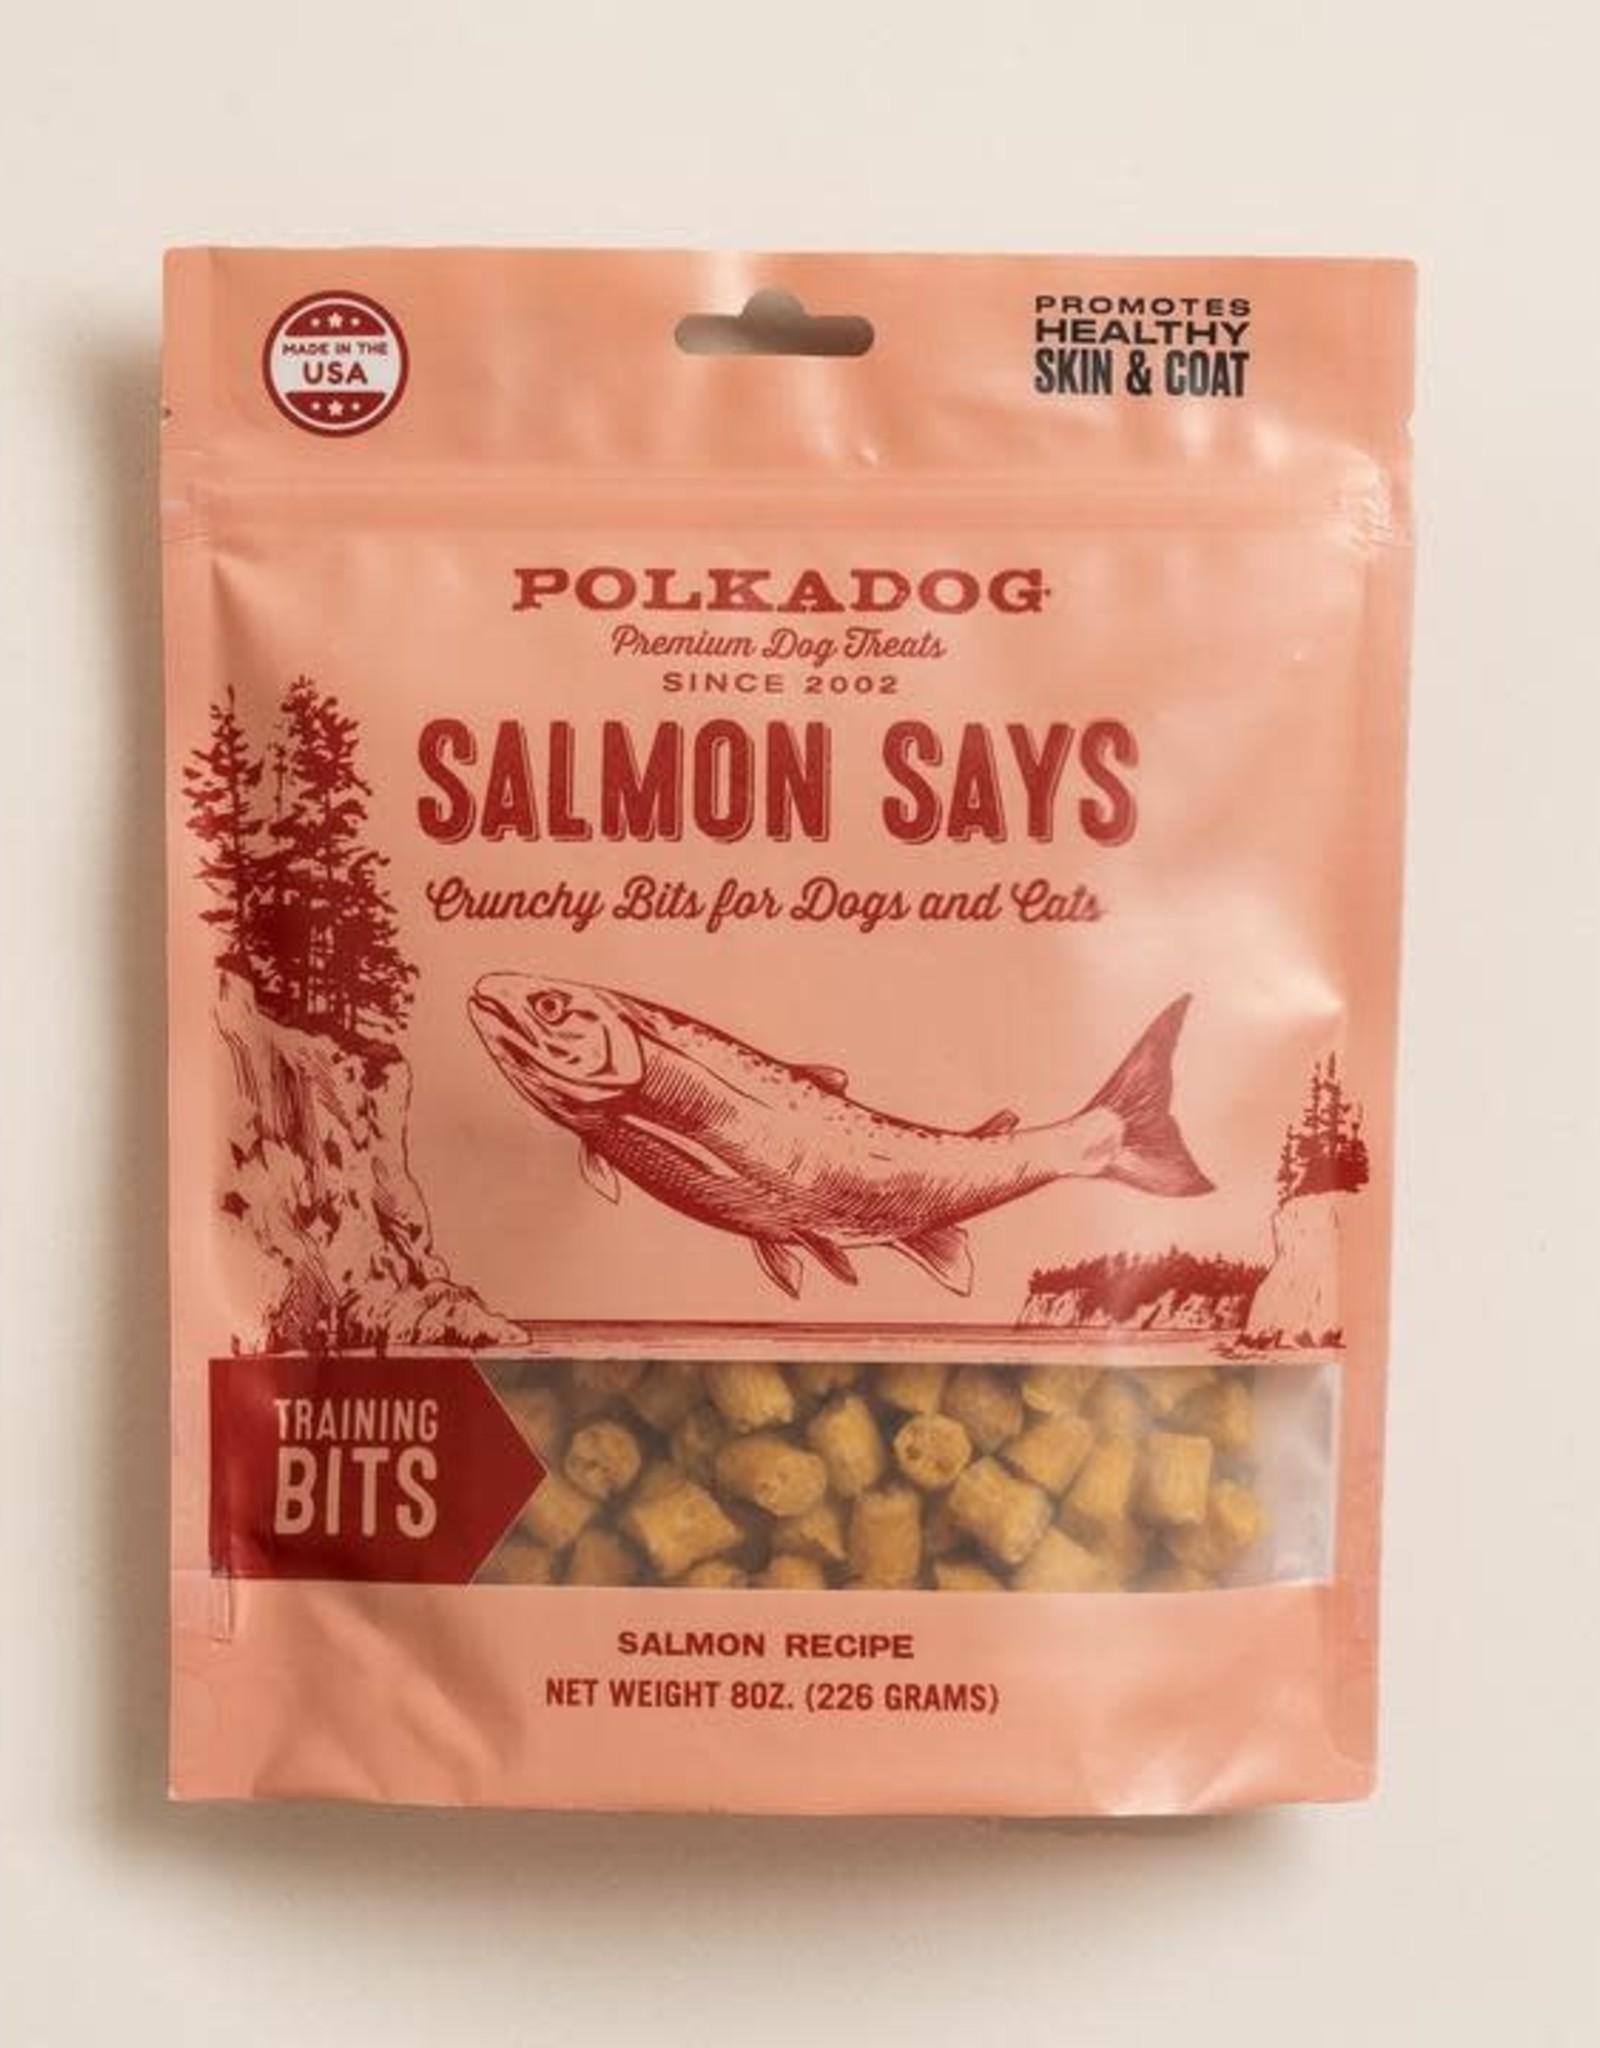 Salmon Says Treats